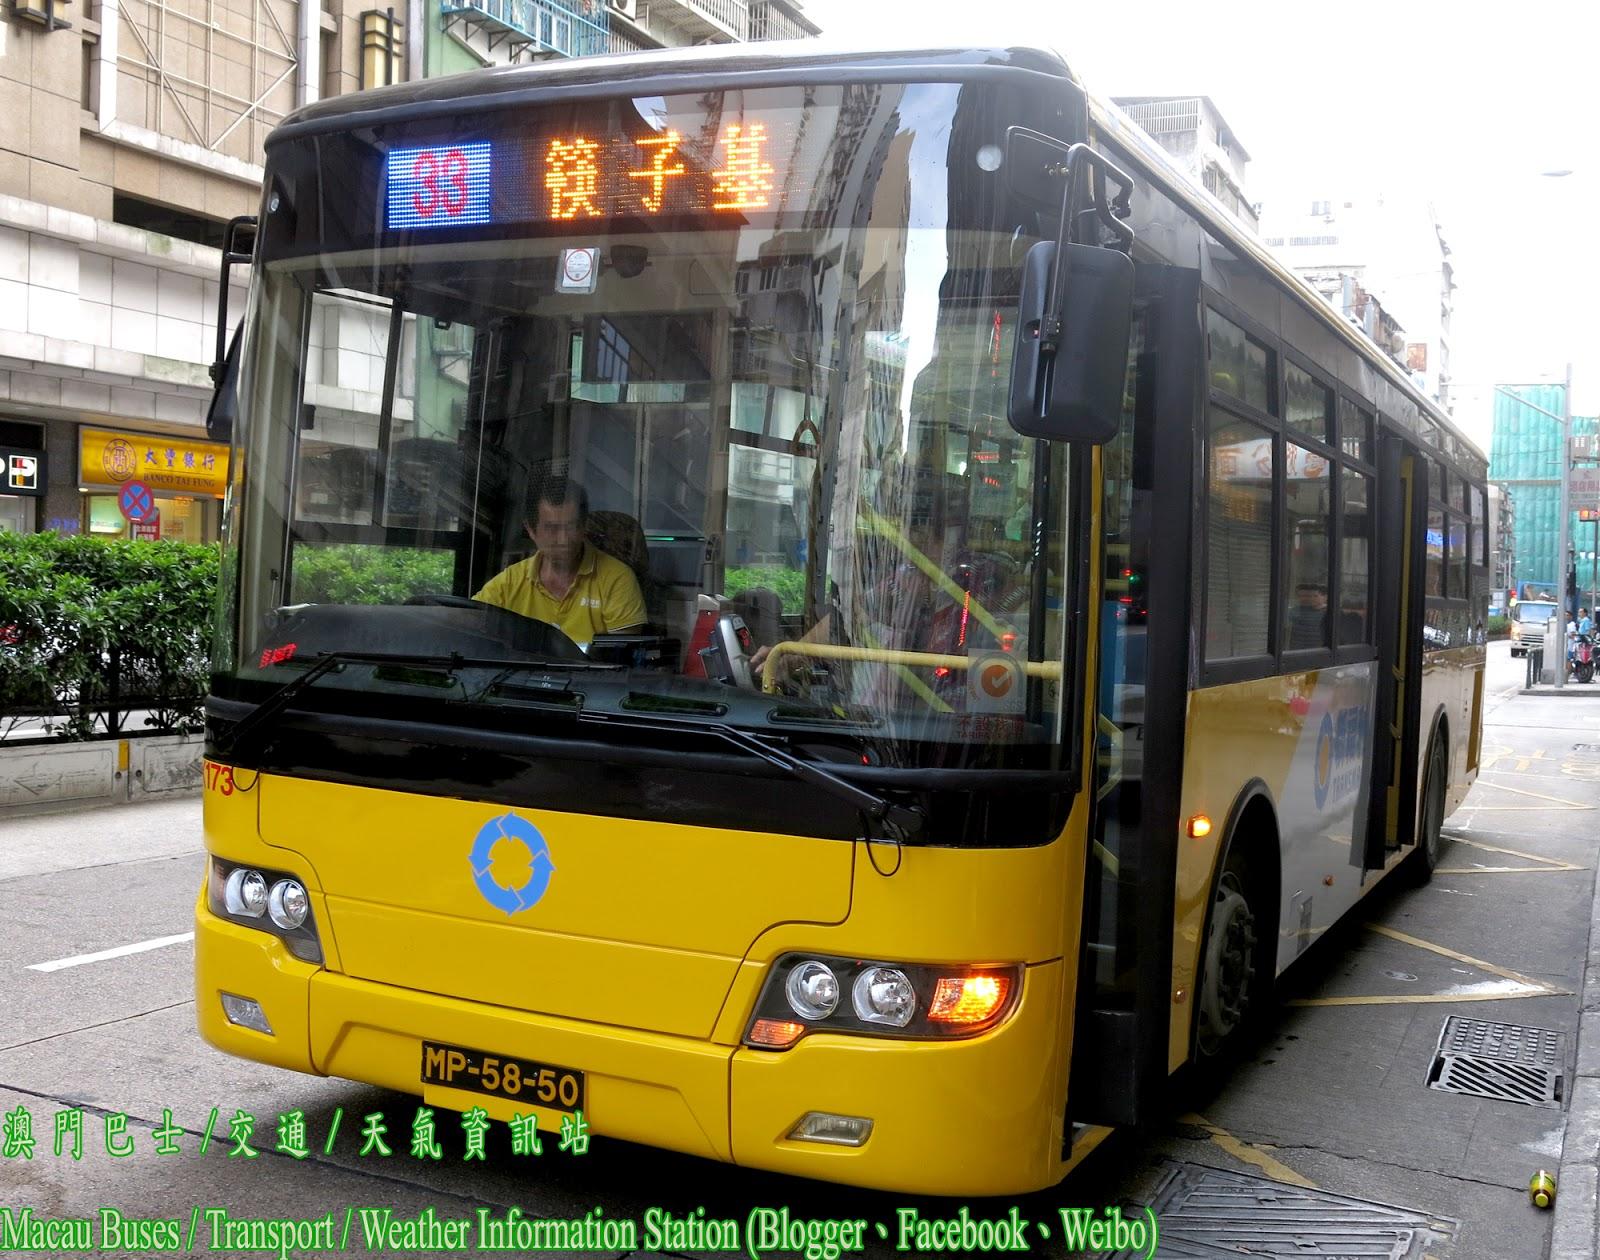 澳 門 巴 士 / 交 通 / 天 氣 資 訊 站 Macau Buses / Transport / Weather Information Station: 新福利海格K173大巴復出且轉新色